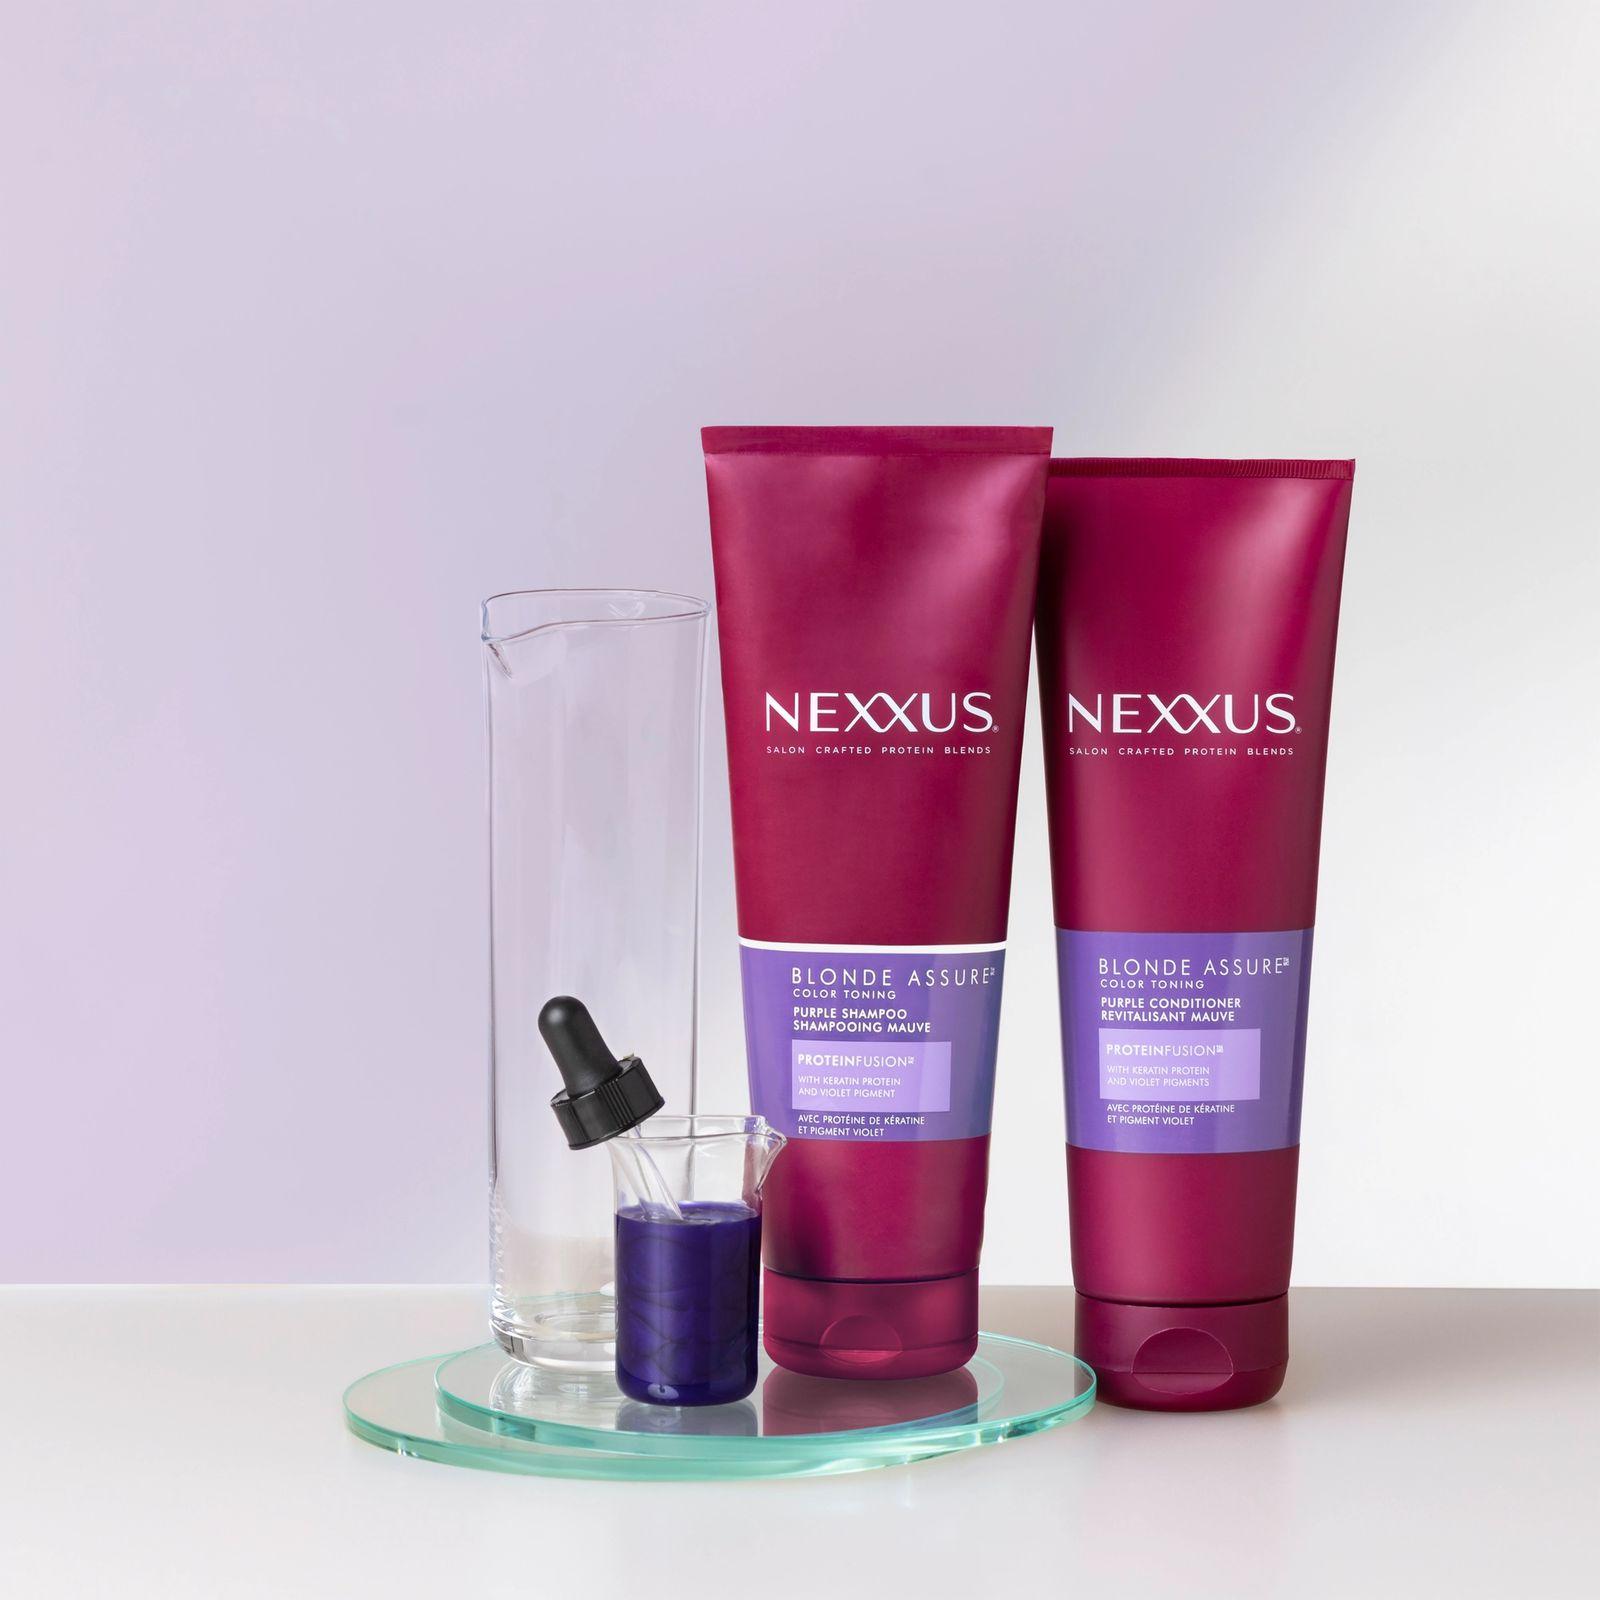 Nexxus Blonde Assure Purple Shampoo & Conditioner Product Shot